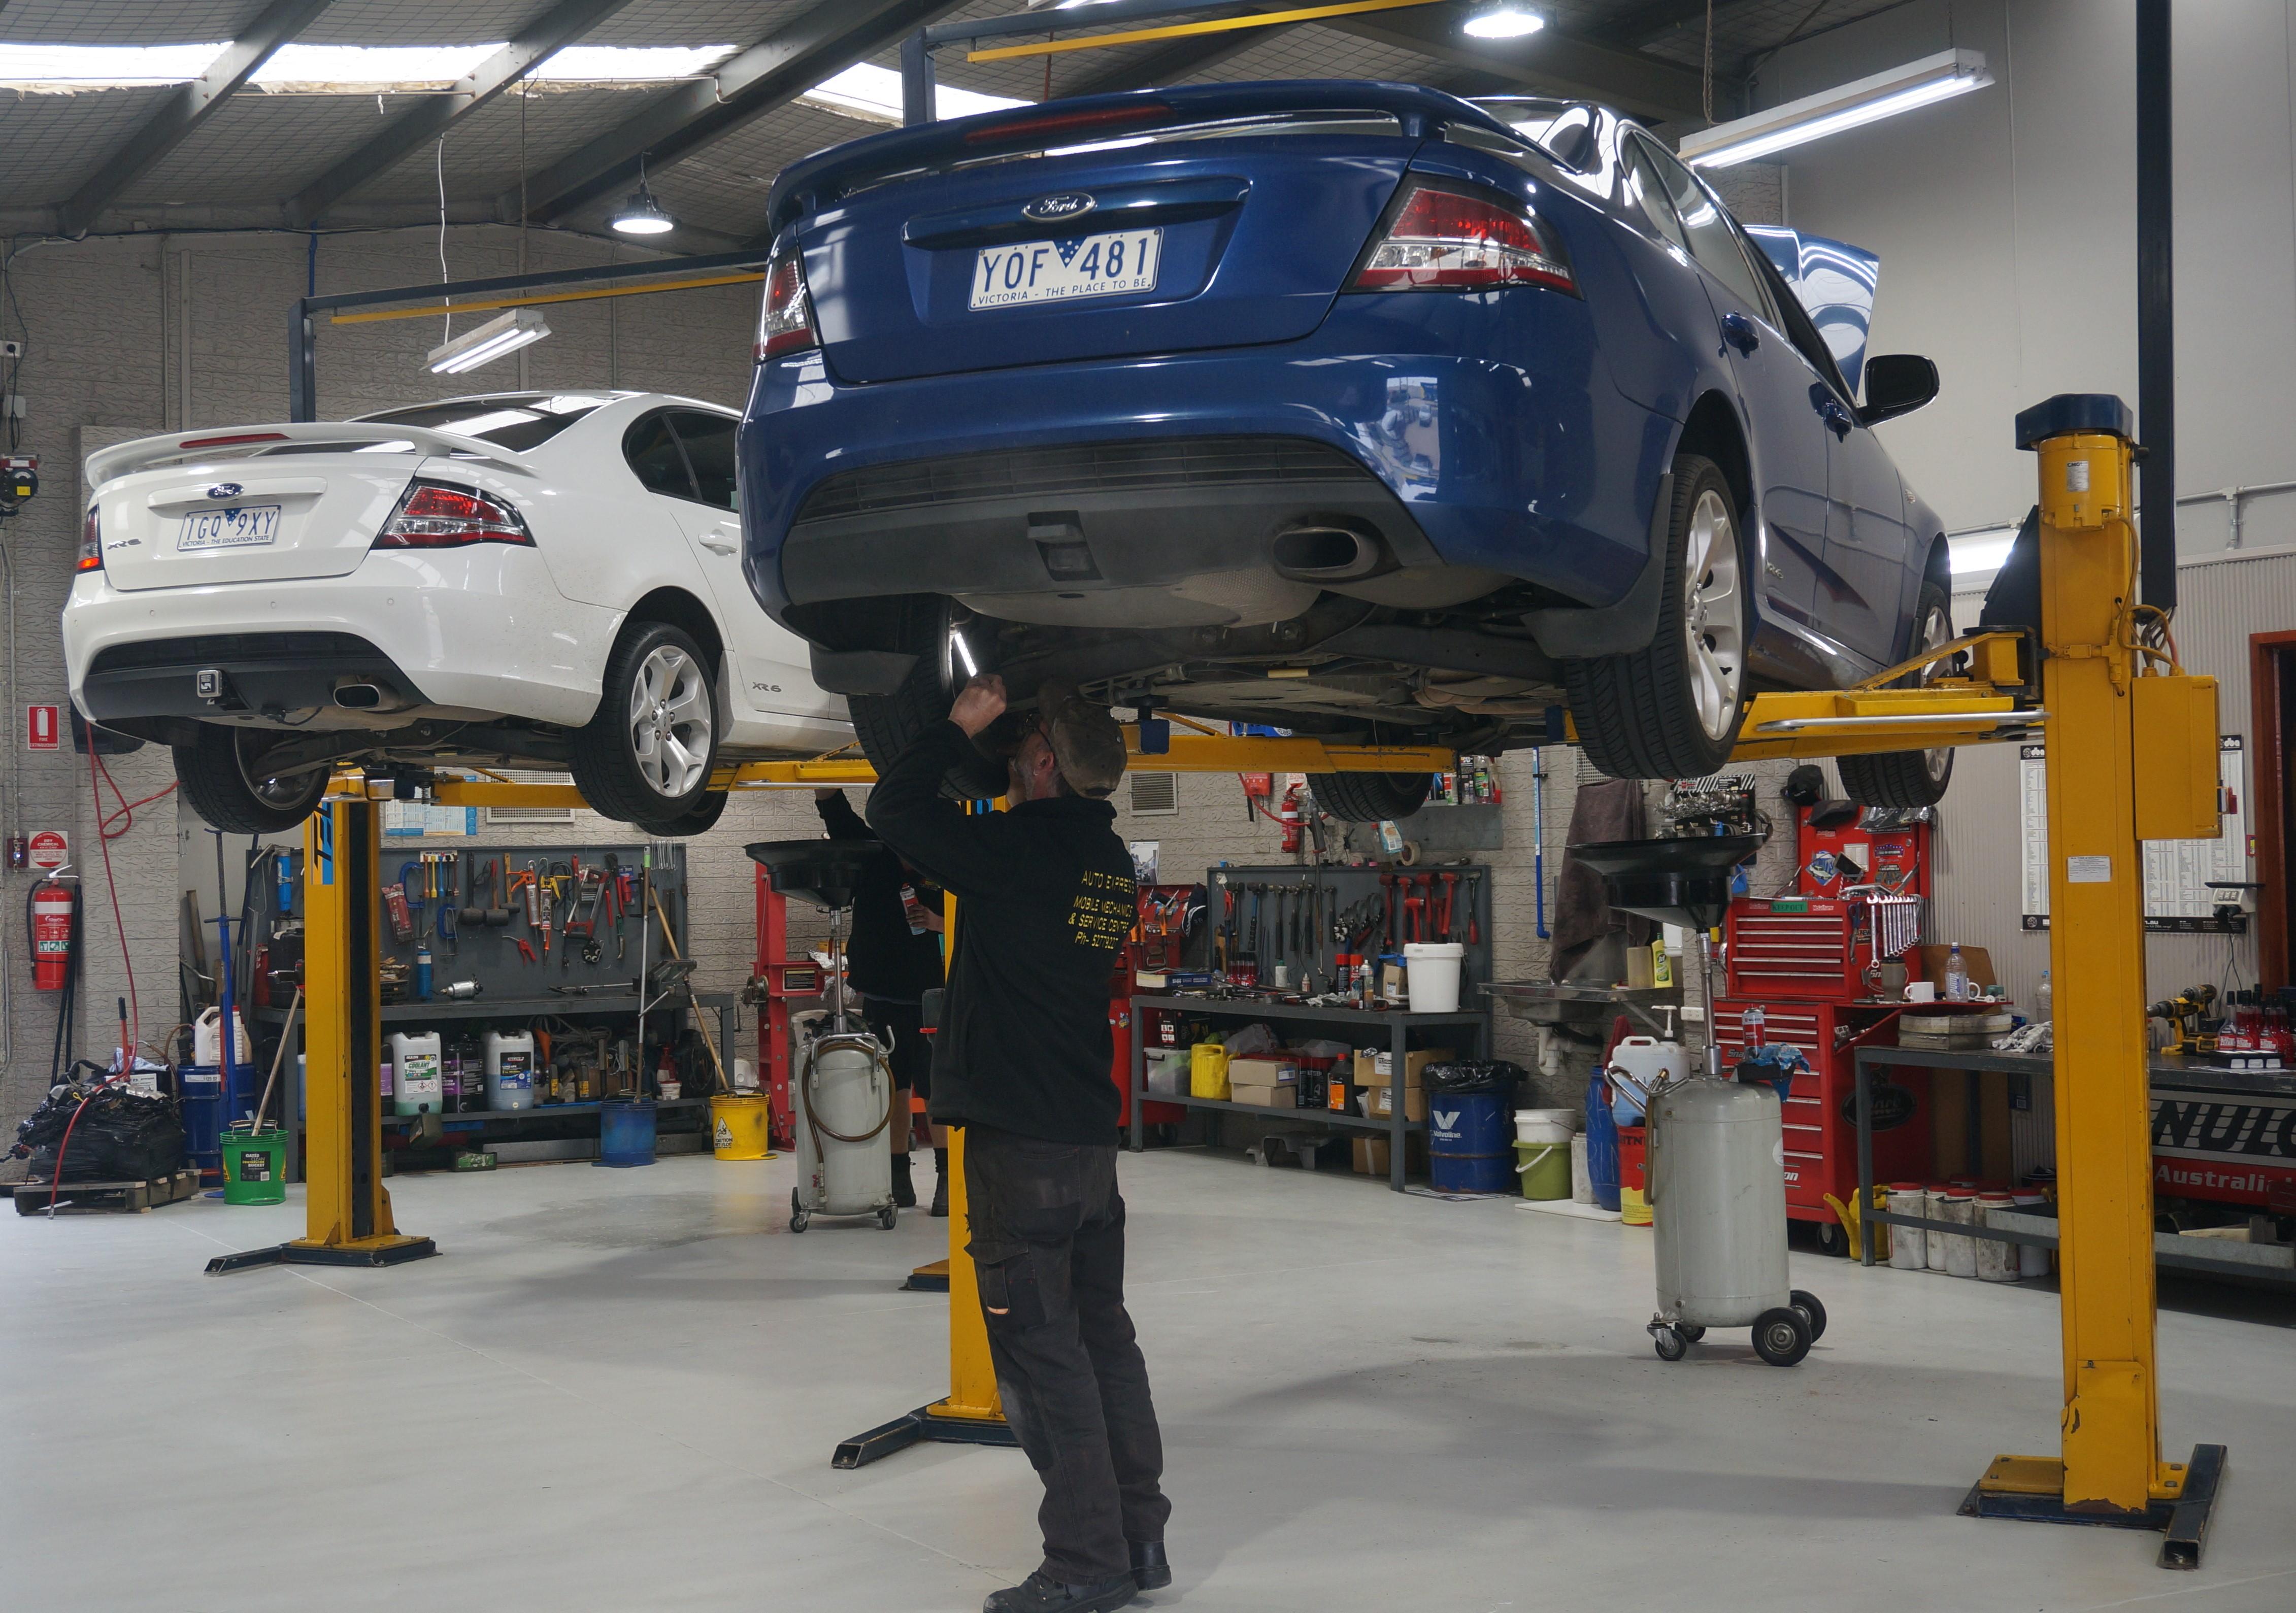 Auto Express Service Centre & Mobile Mechanics - Mechanic ...